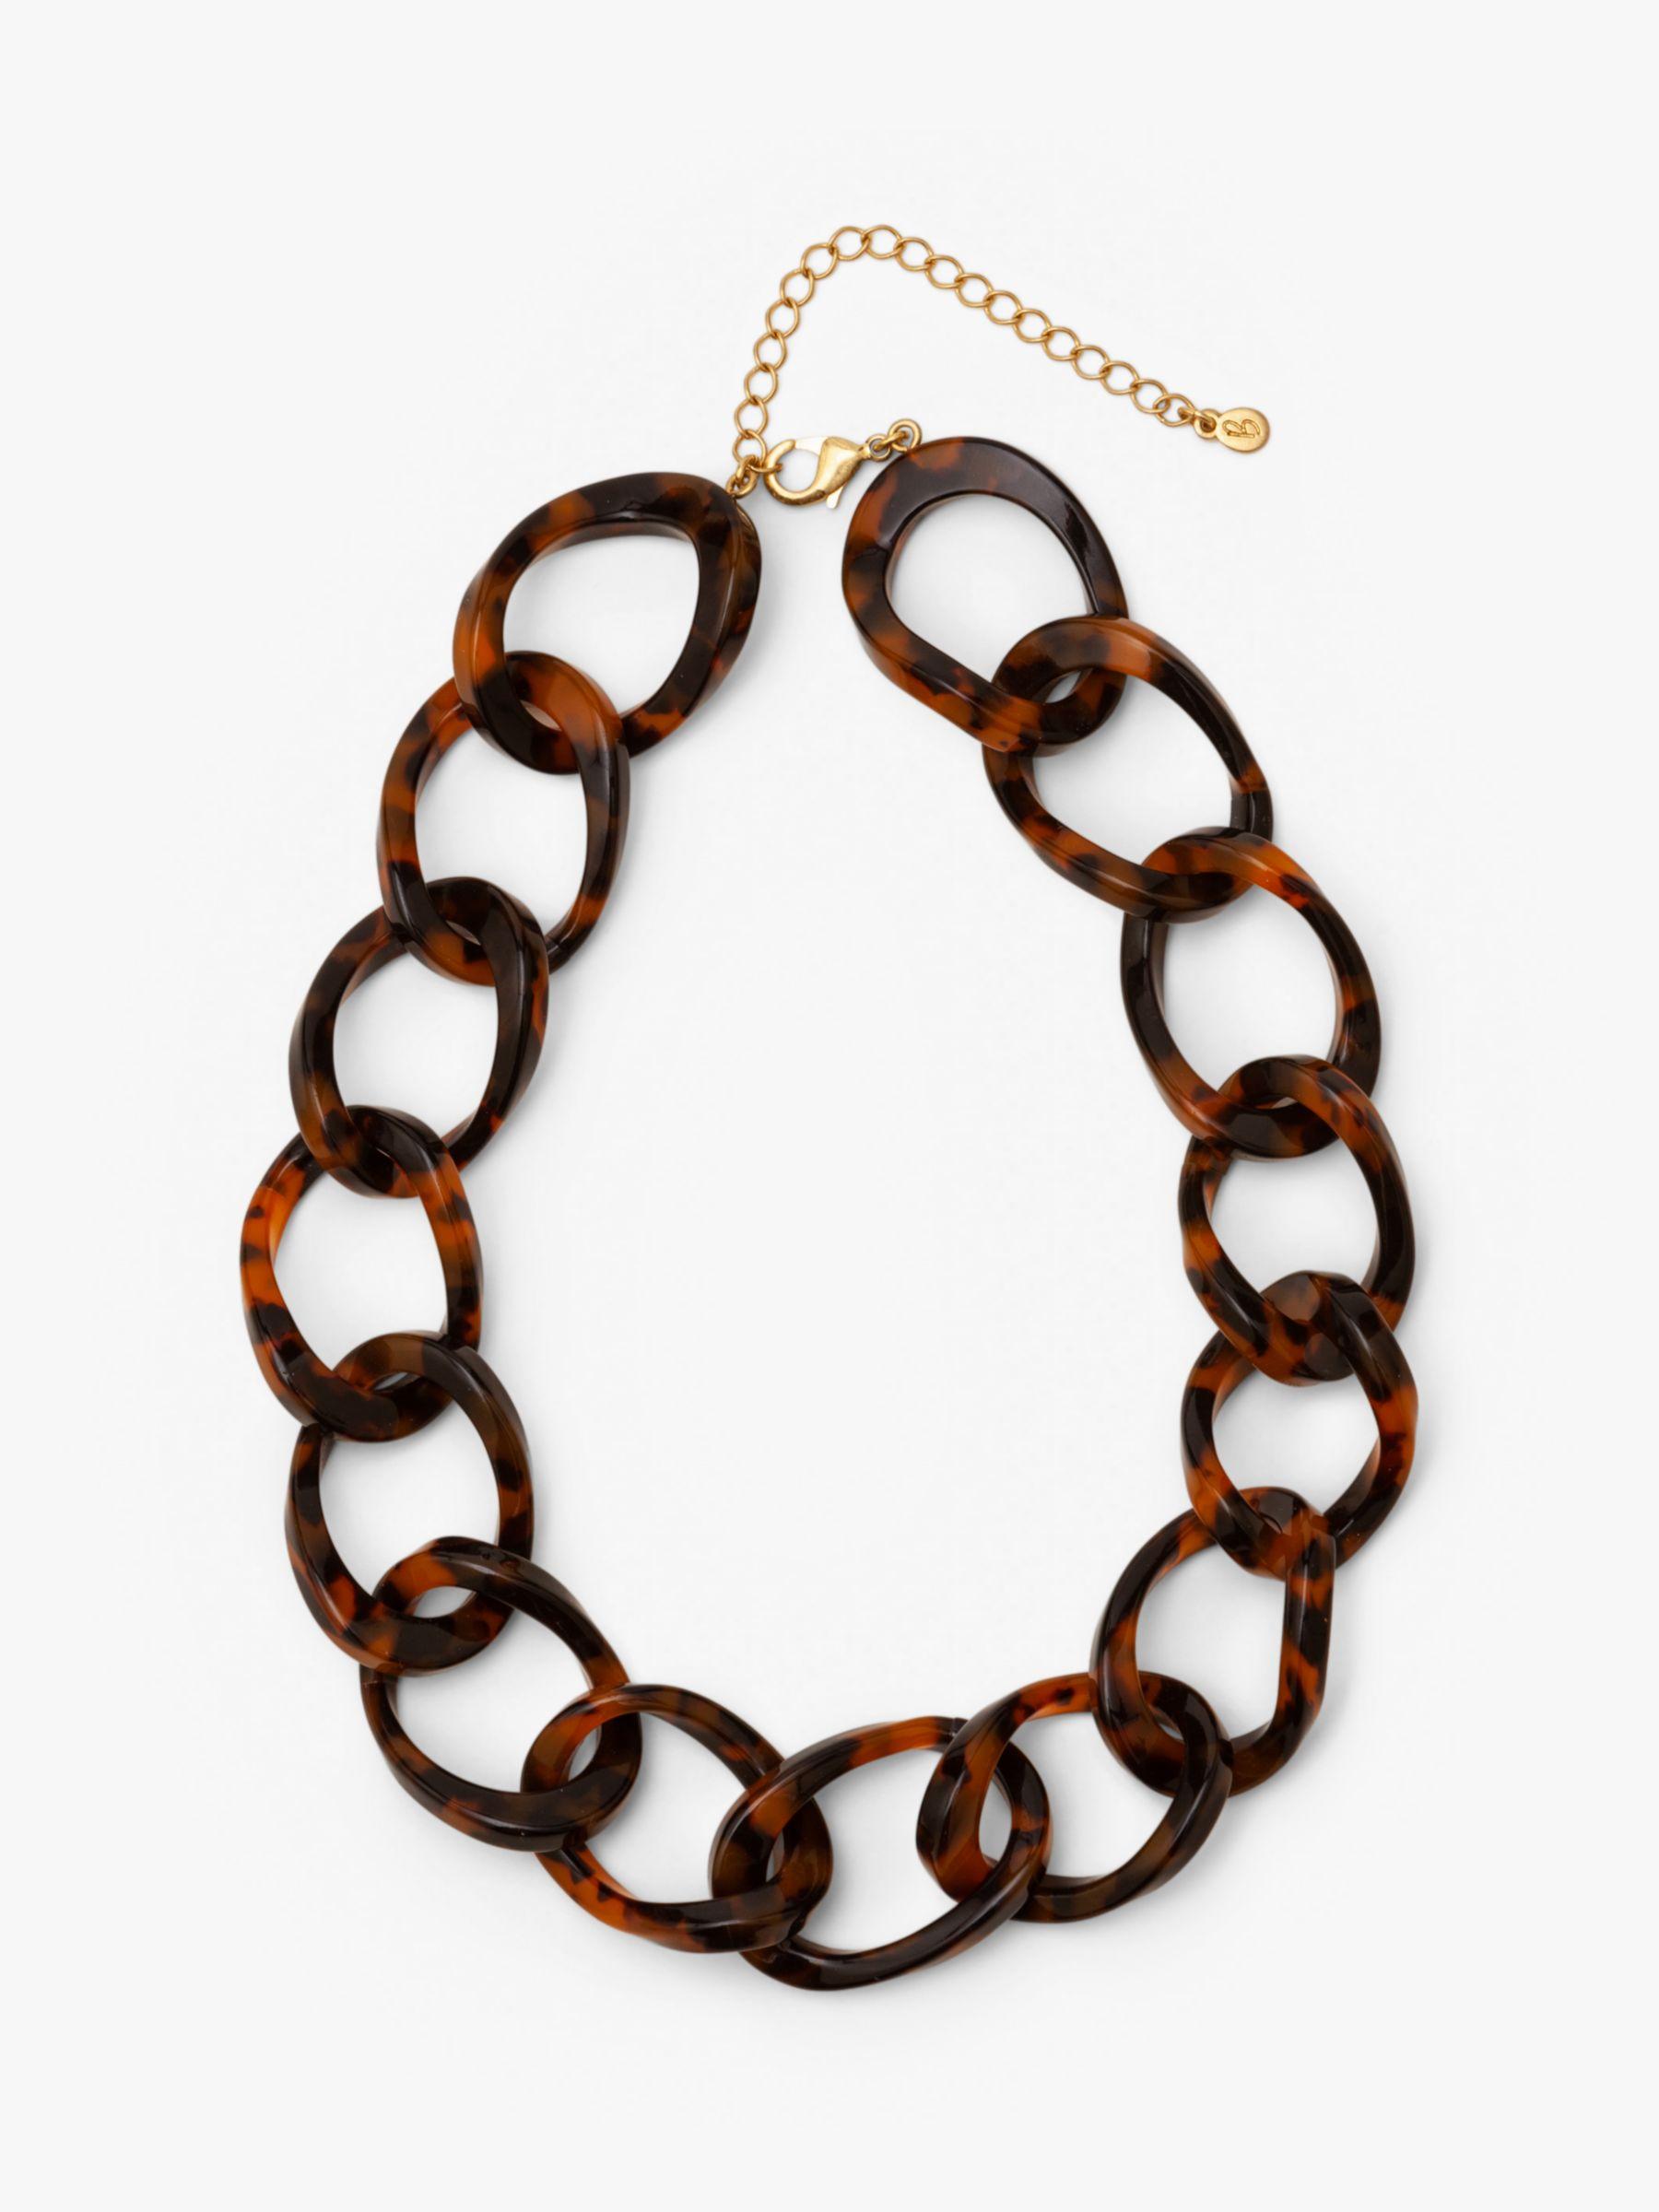 Boden Boden Resin Link Necklace, Brown